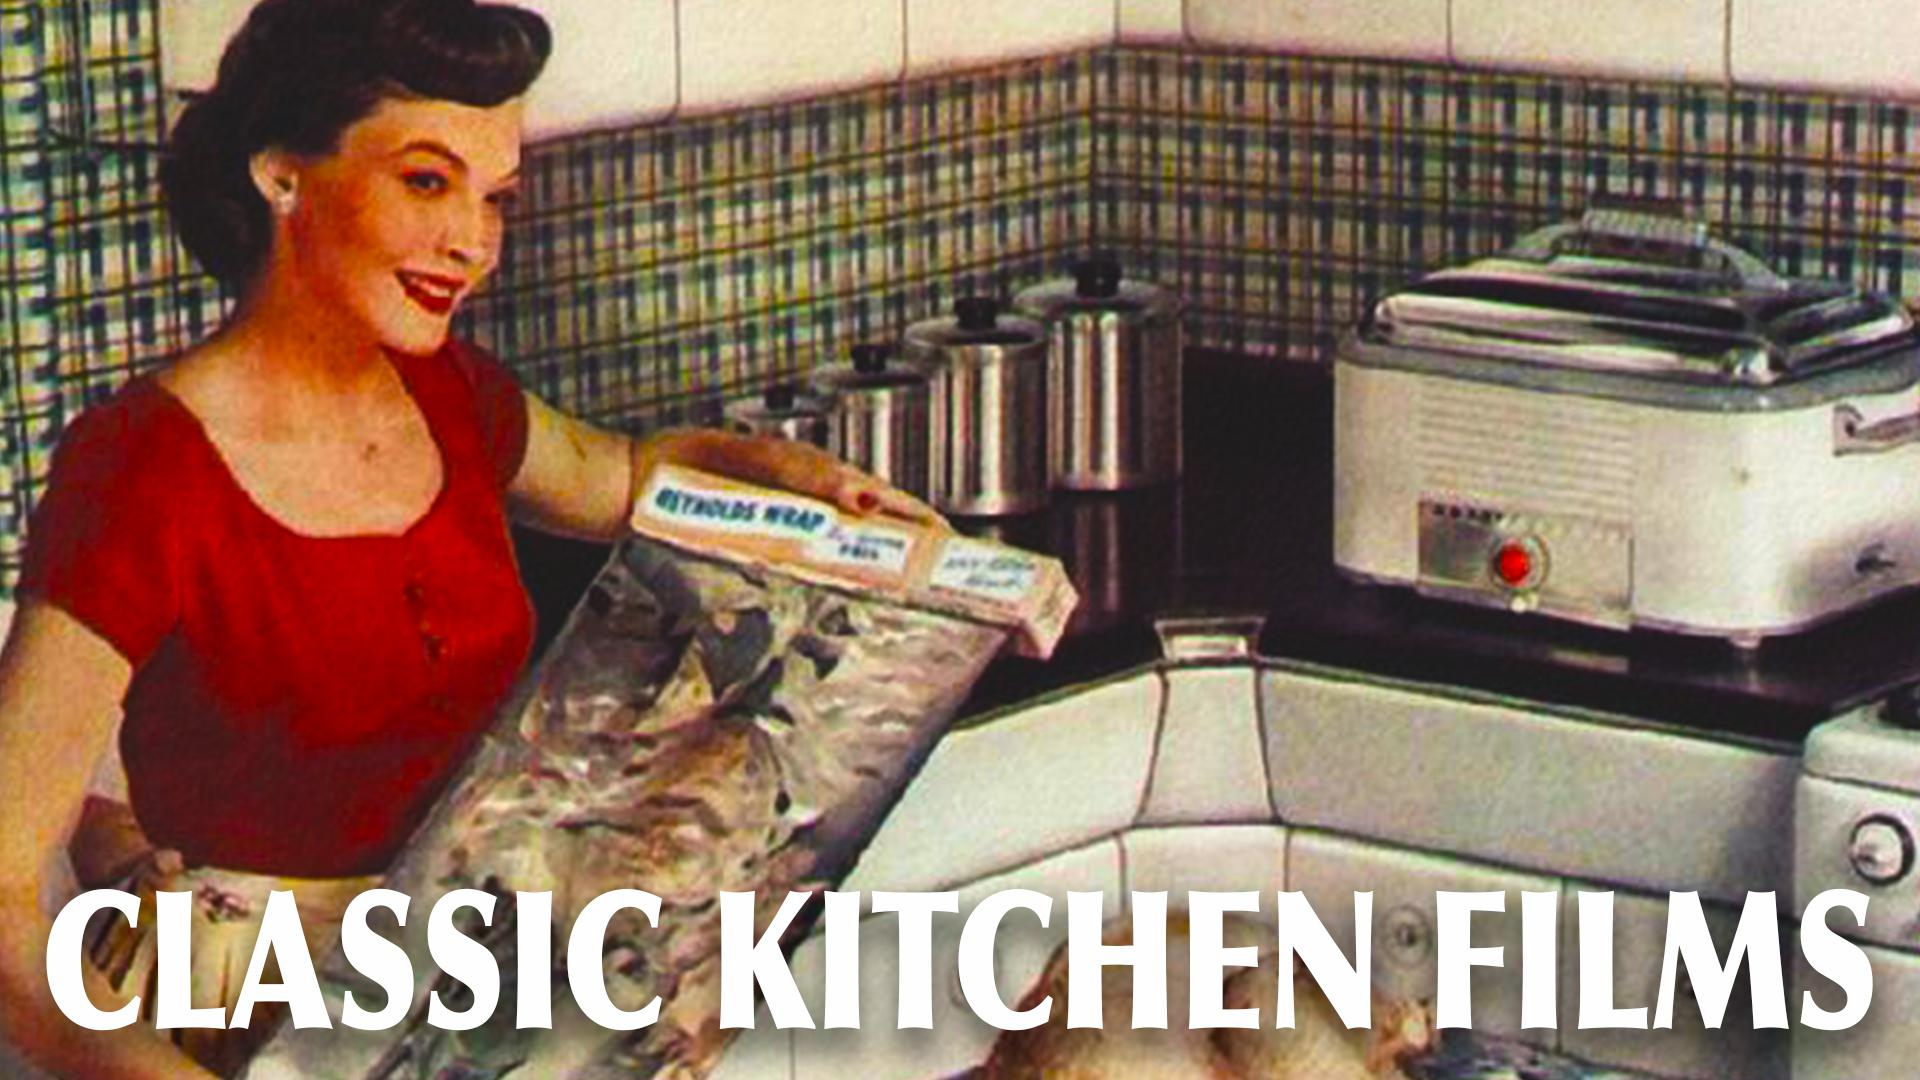 Classic Kitchen Films